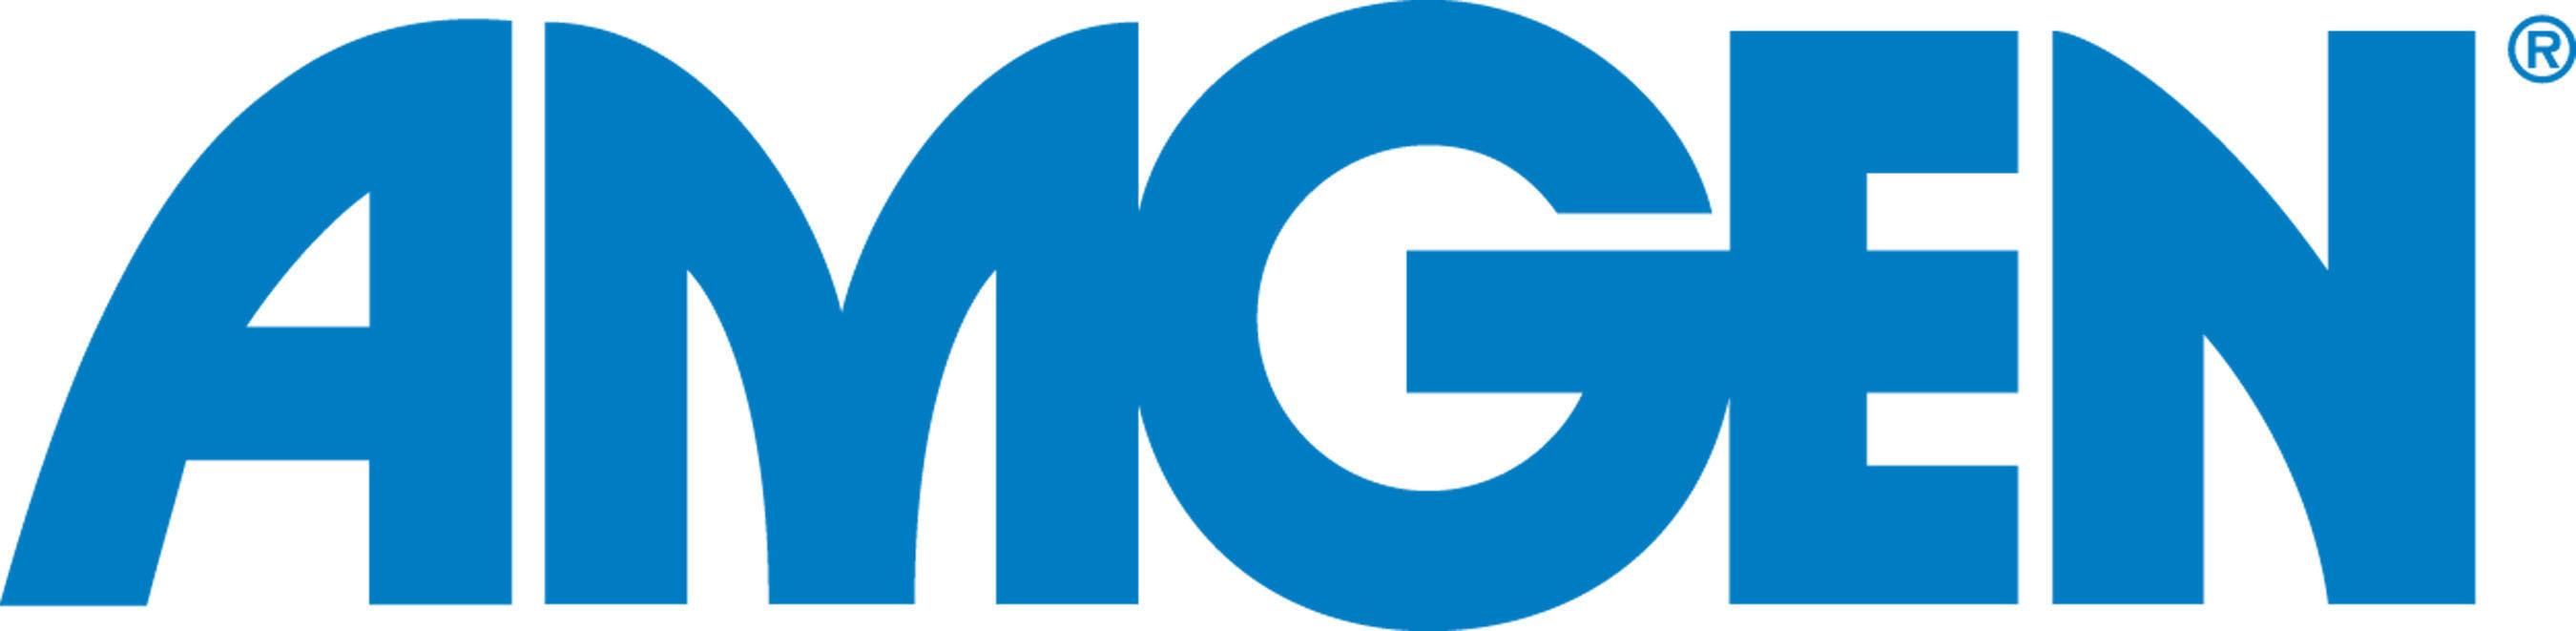 Amgen To Acquire Otezla® For $13.4 Billion In Cash image